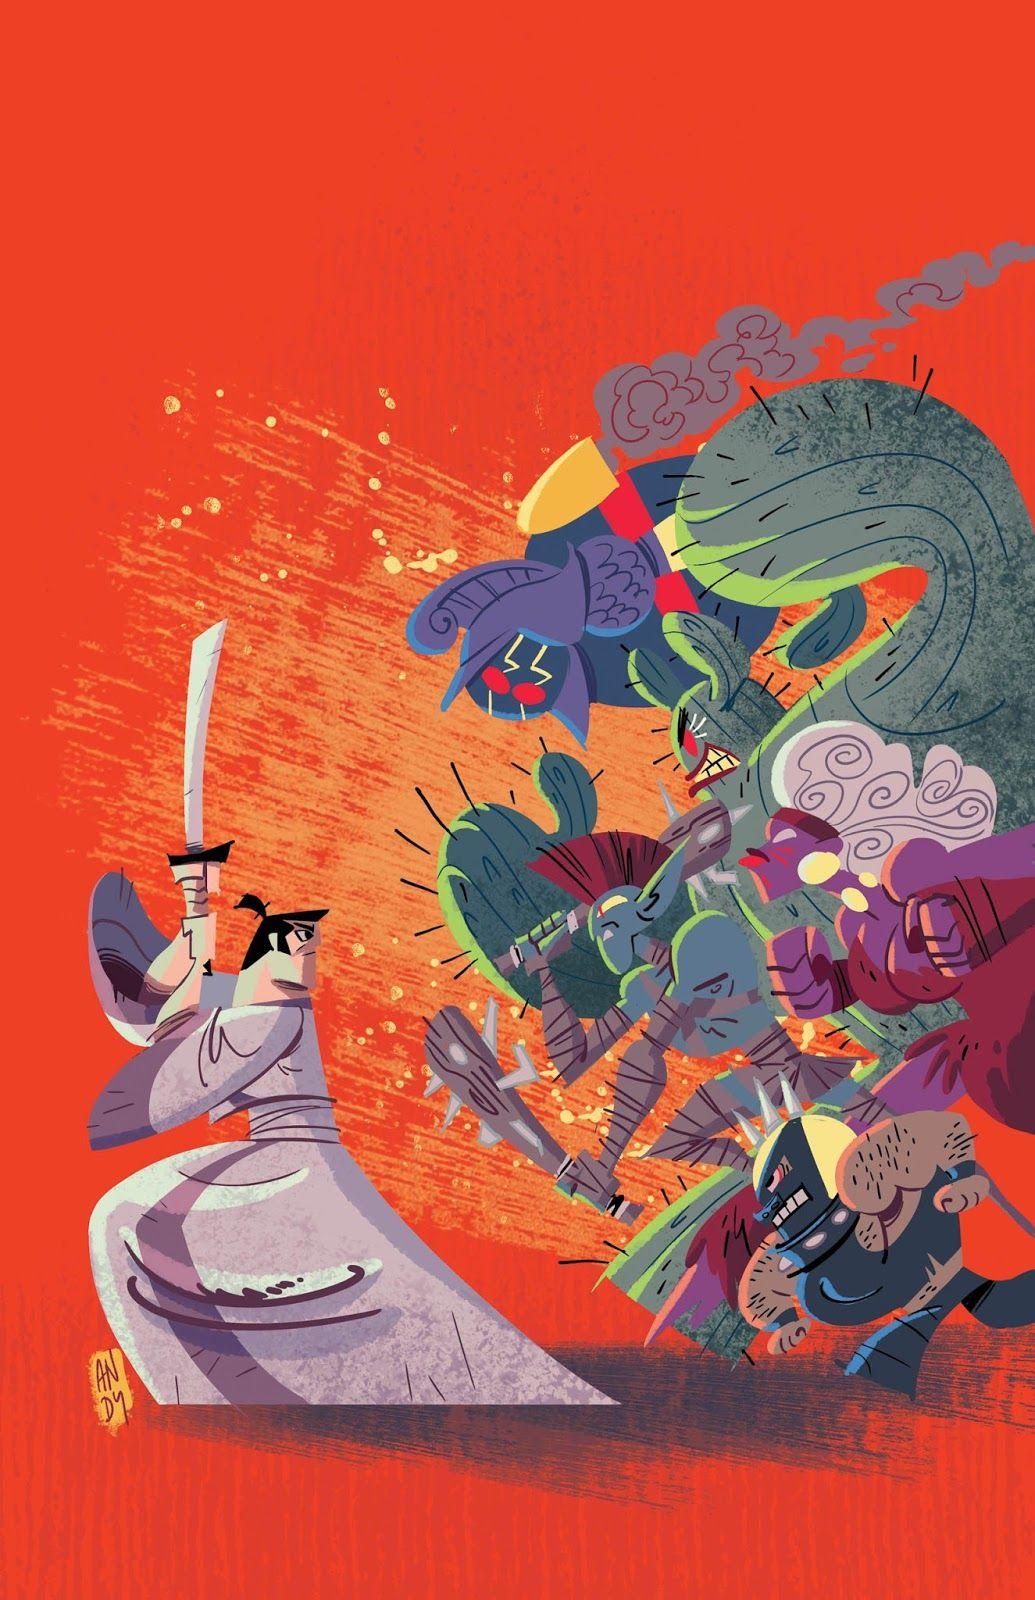 Samurai Jack Samurai jack, Samurai, Comic books art